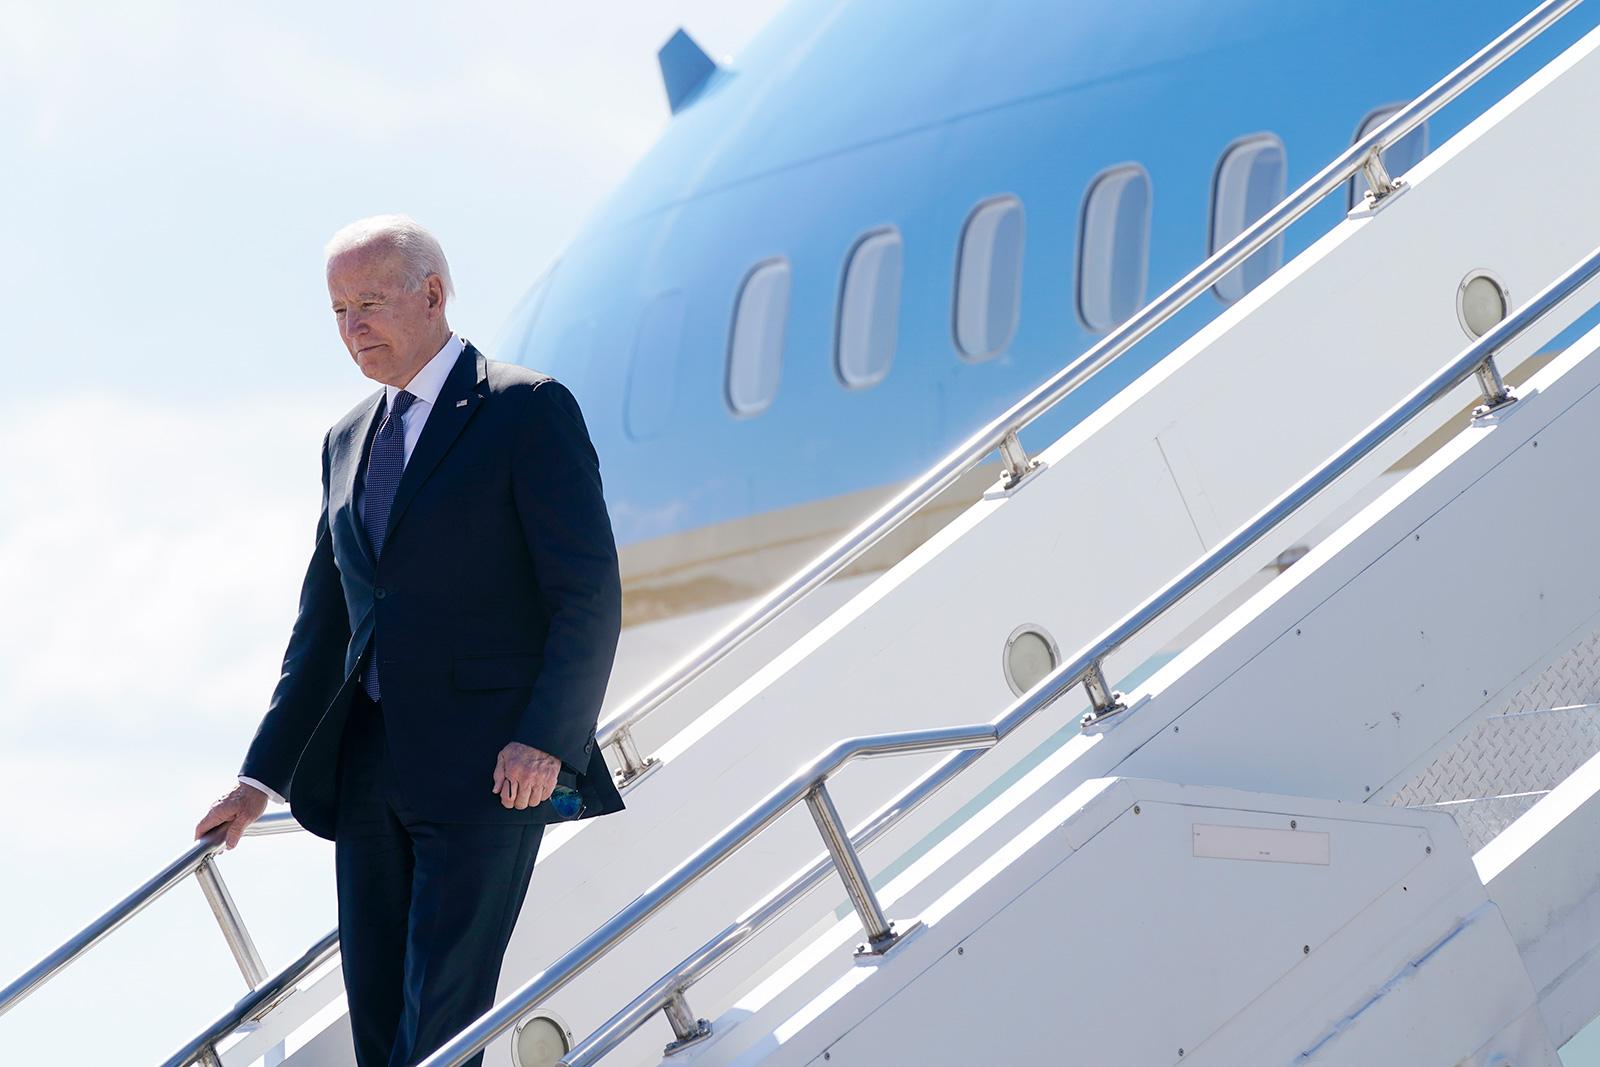 President Joe Biden steps off Air Force One at Geneva Airport in Geneva, Switzerland, on Tuesday, June 15.